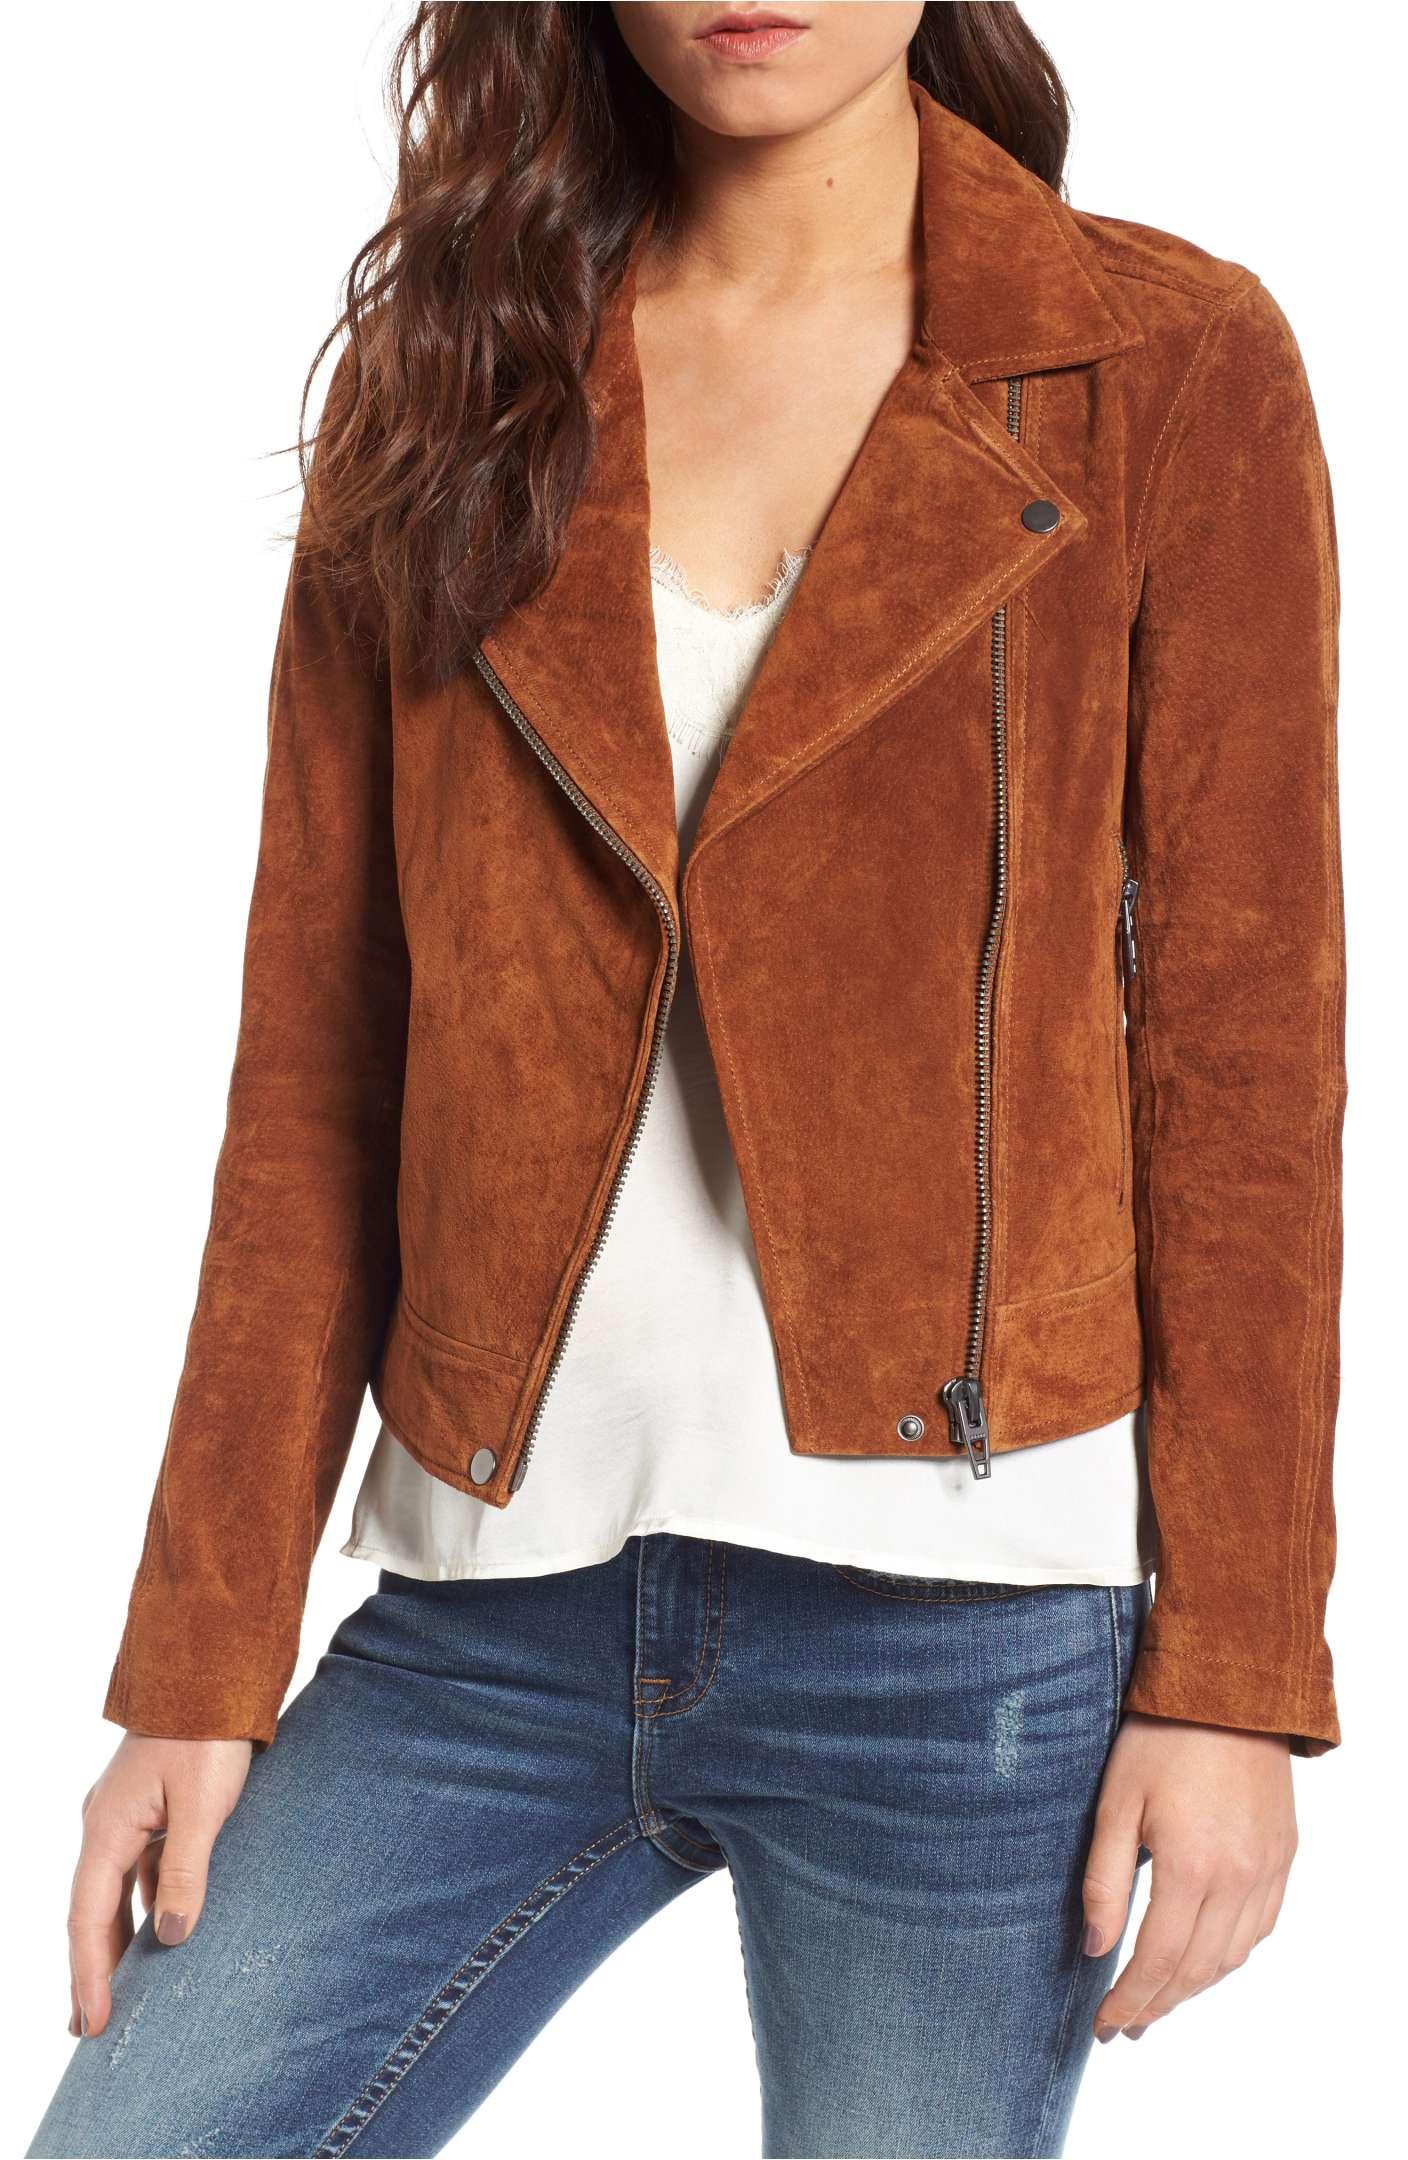 cognac jacket.jpg